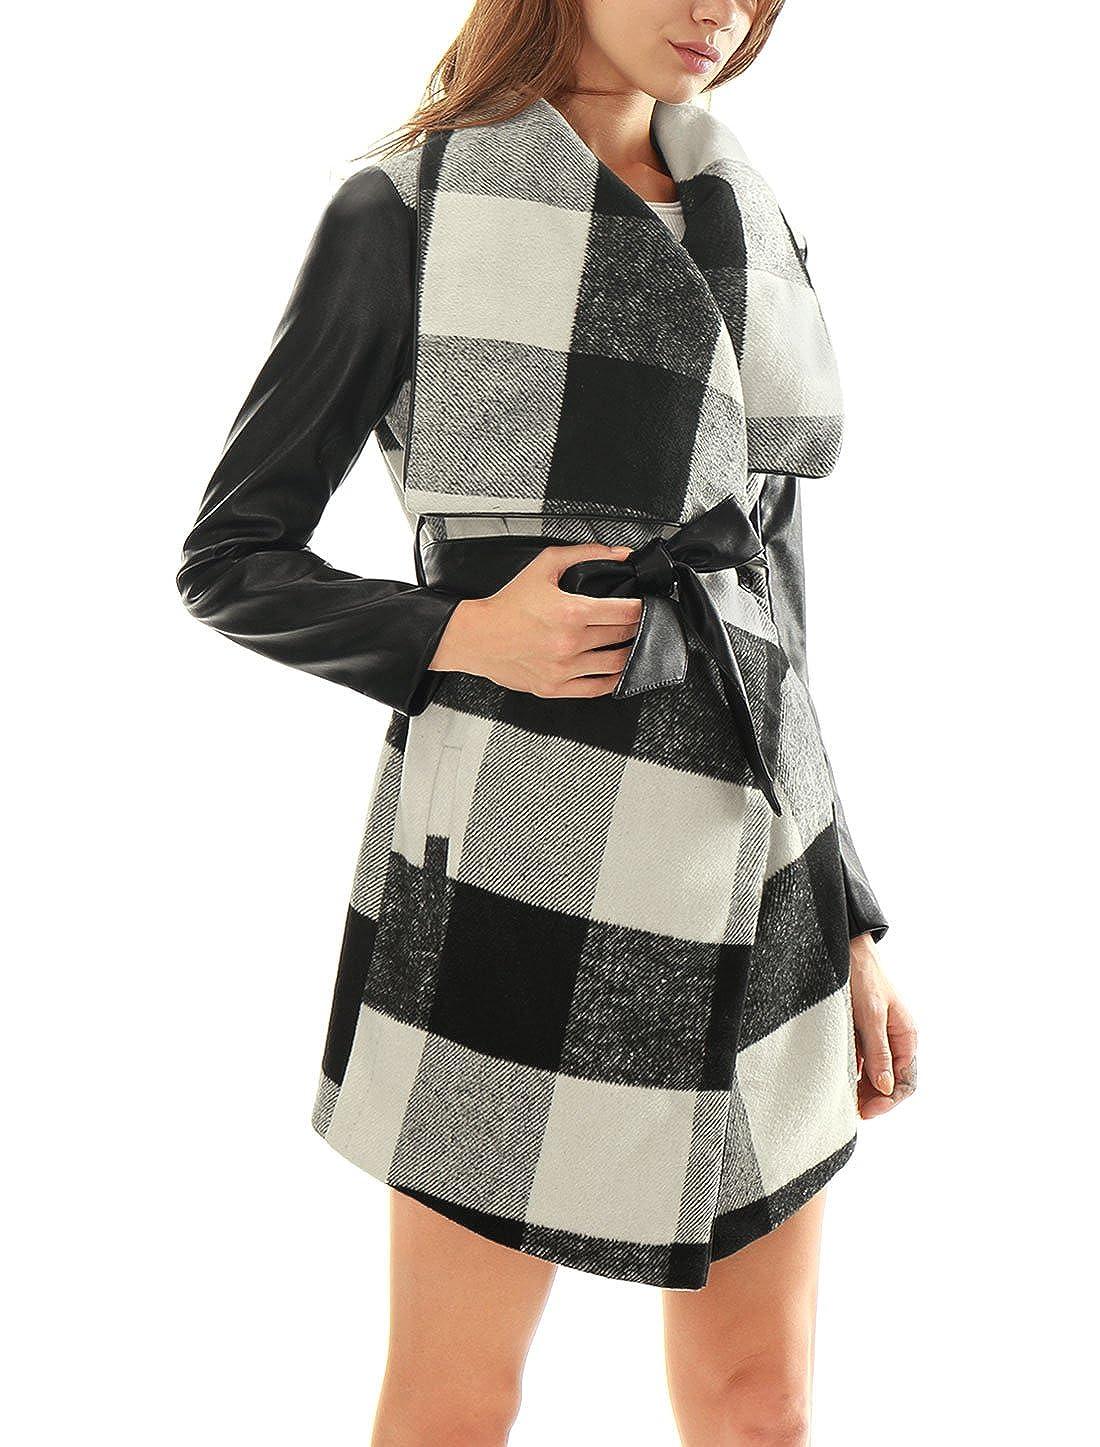 Allegra K Women's Plaids PU Panel Turn Down Collar Belted Coat Black M a16071800ux0562